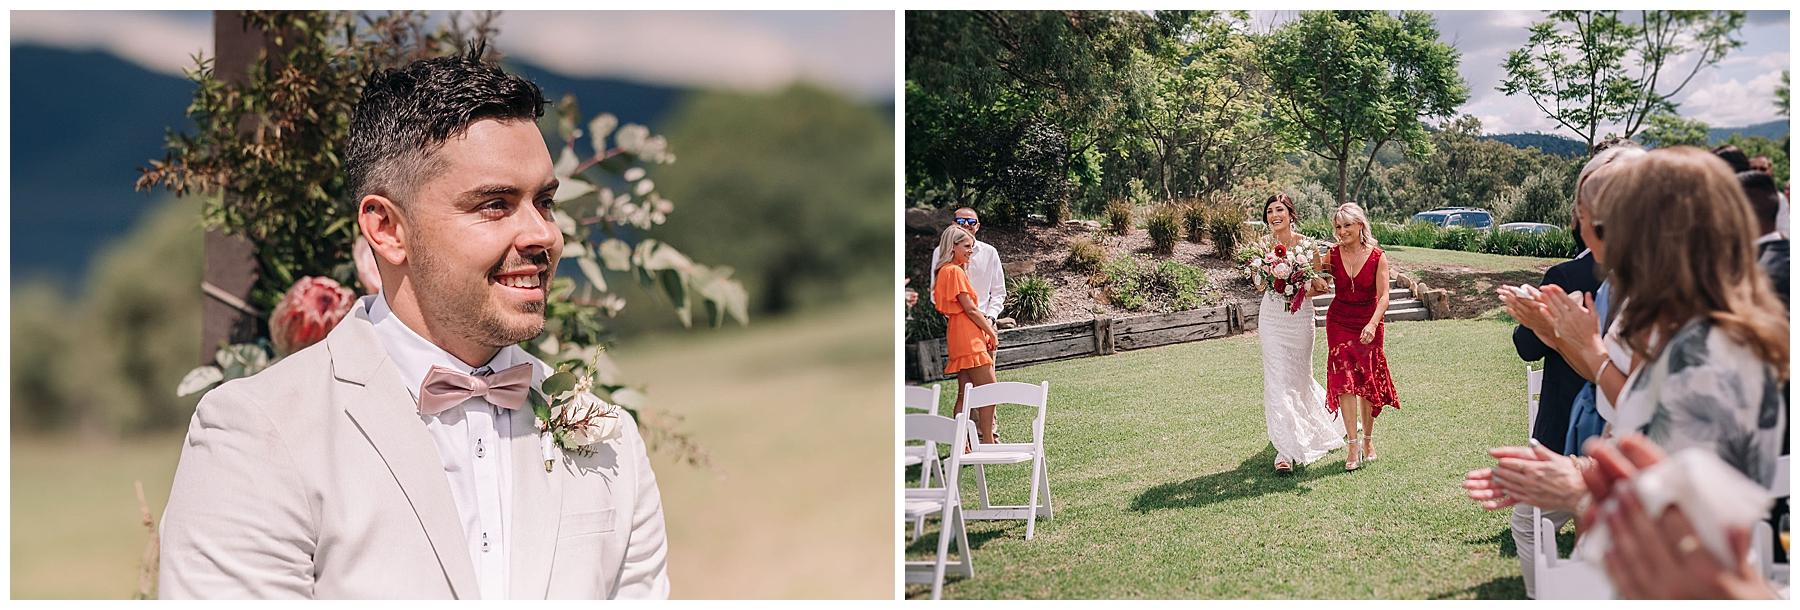 Adam's Peak Wedding Photos + Popcorn Photography_0021.jpg